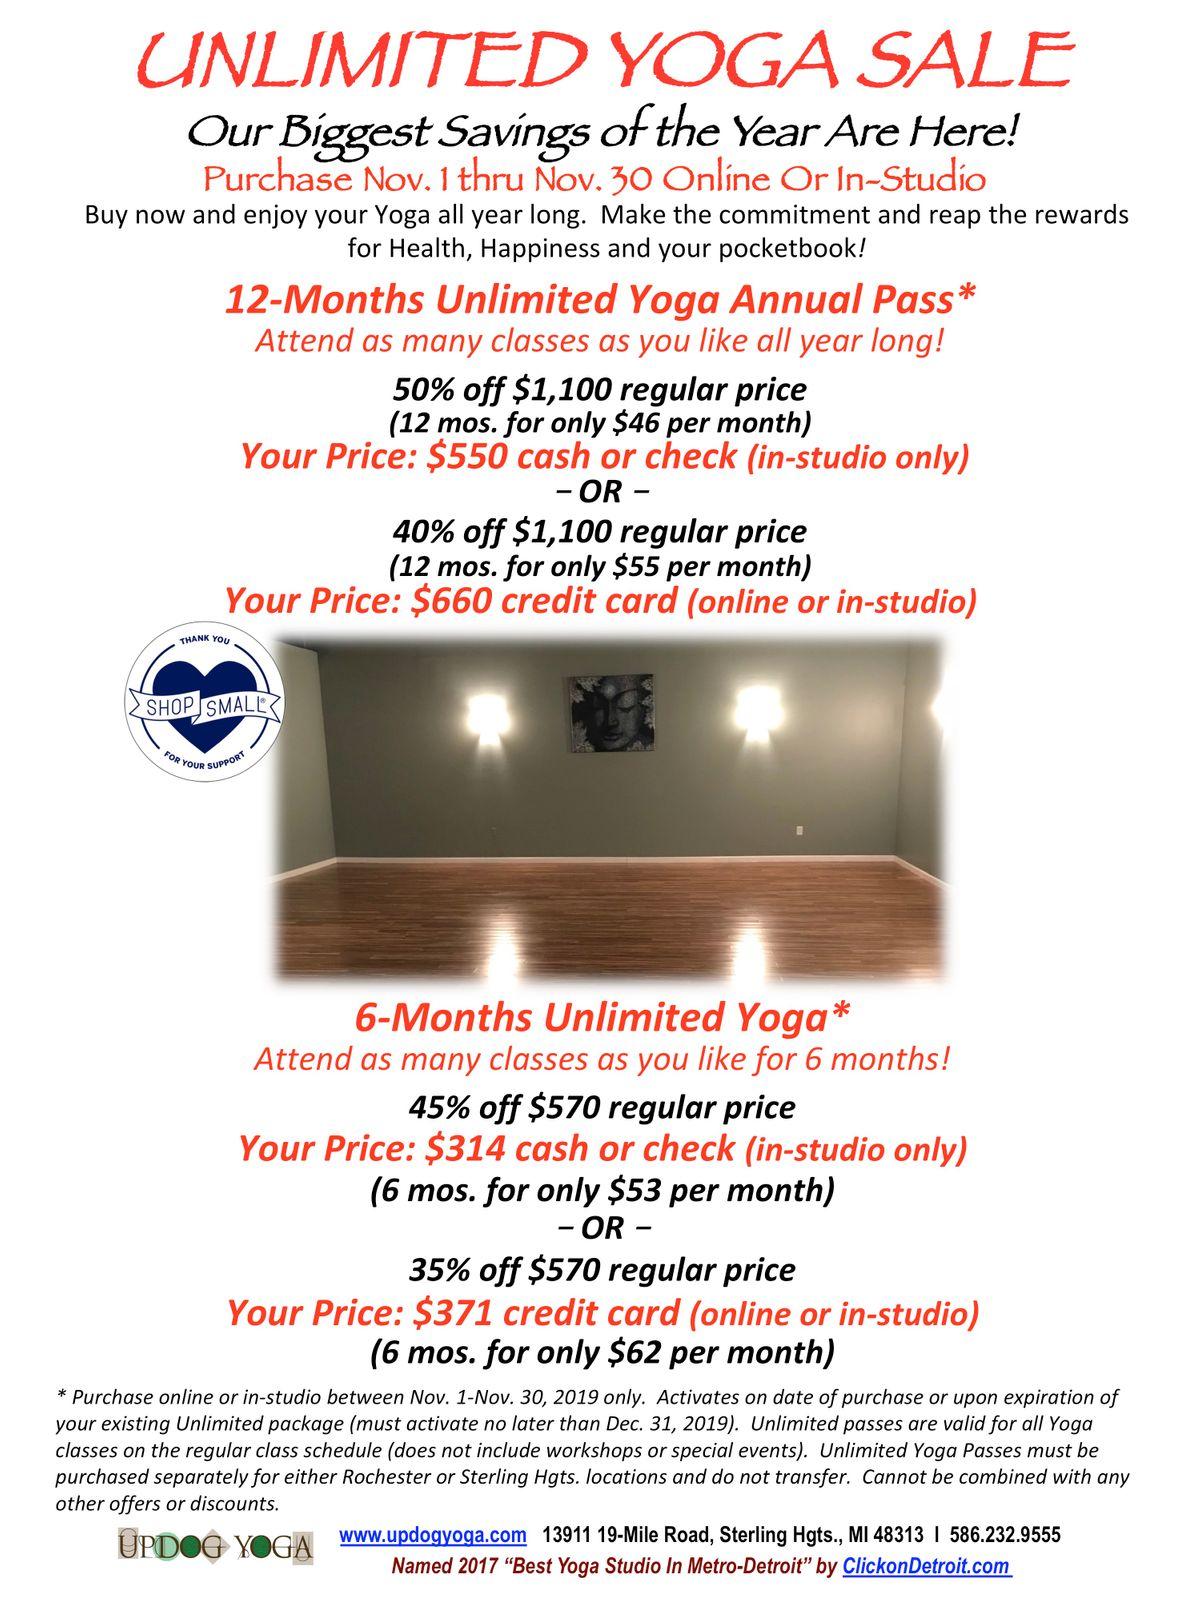 Unlimited Pass Savings 2019_UpDog East.jpg